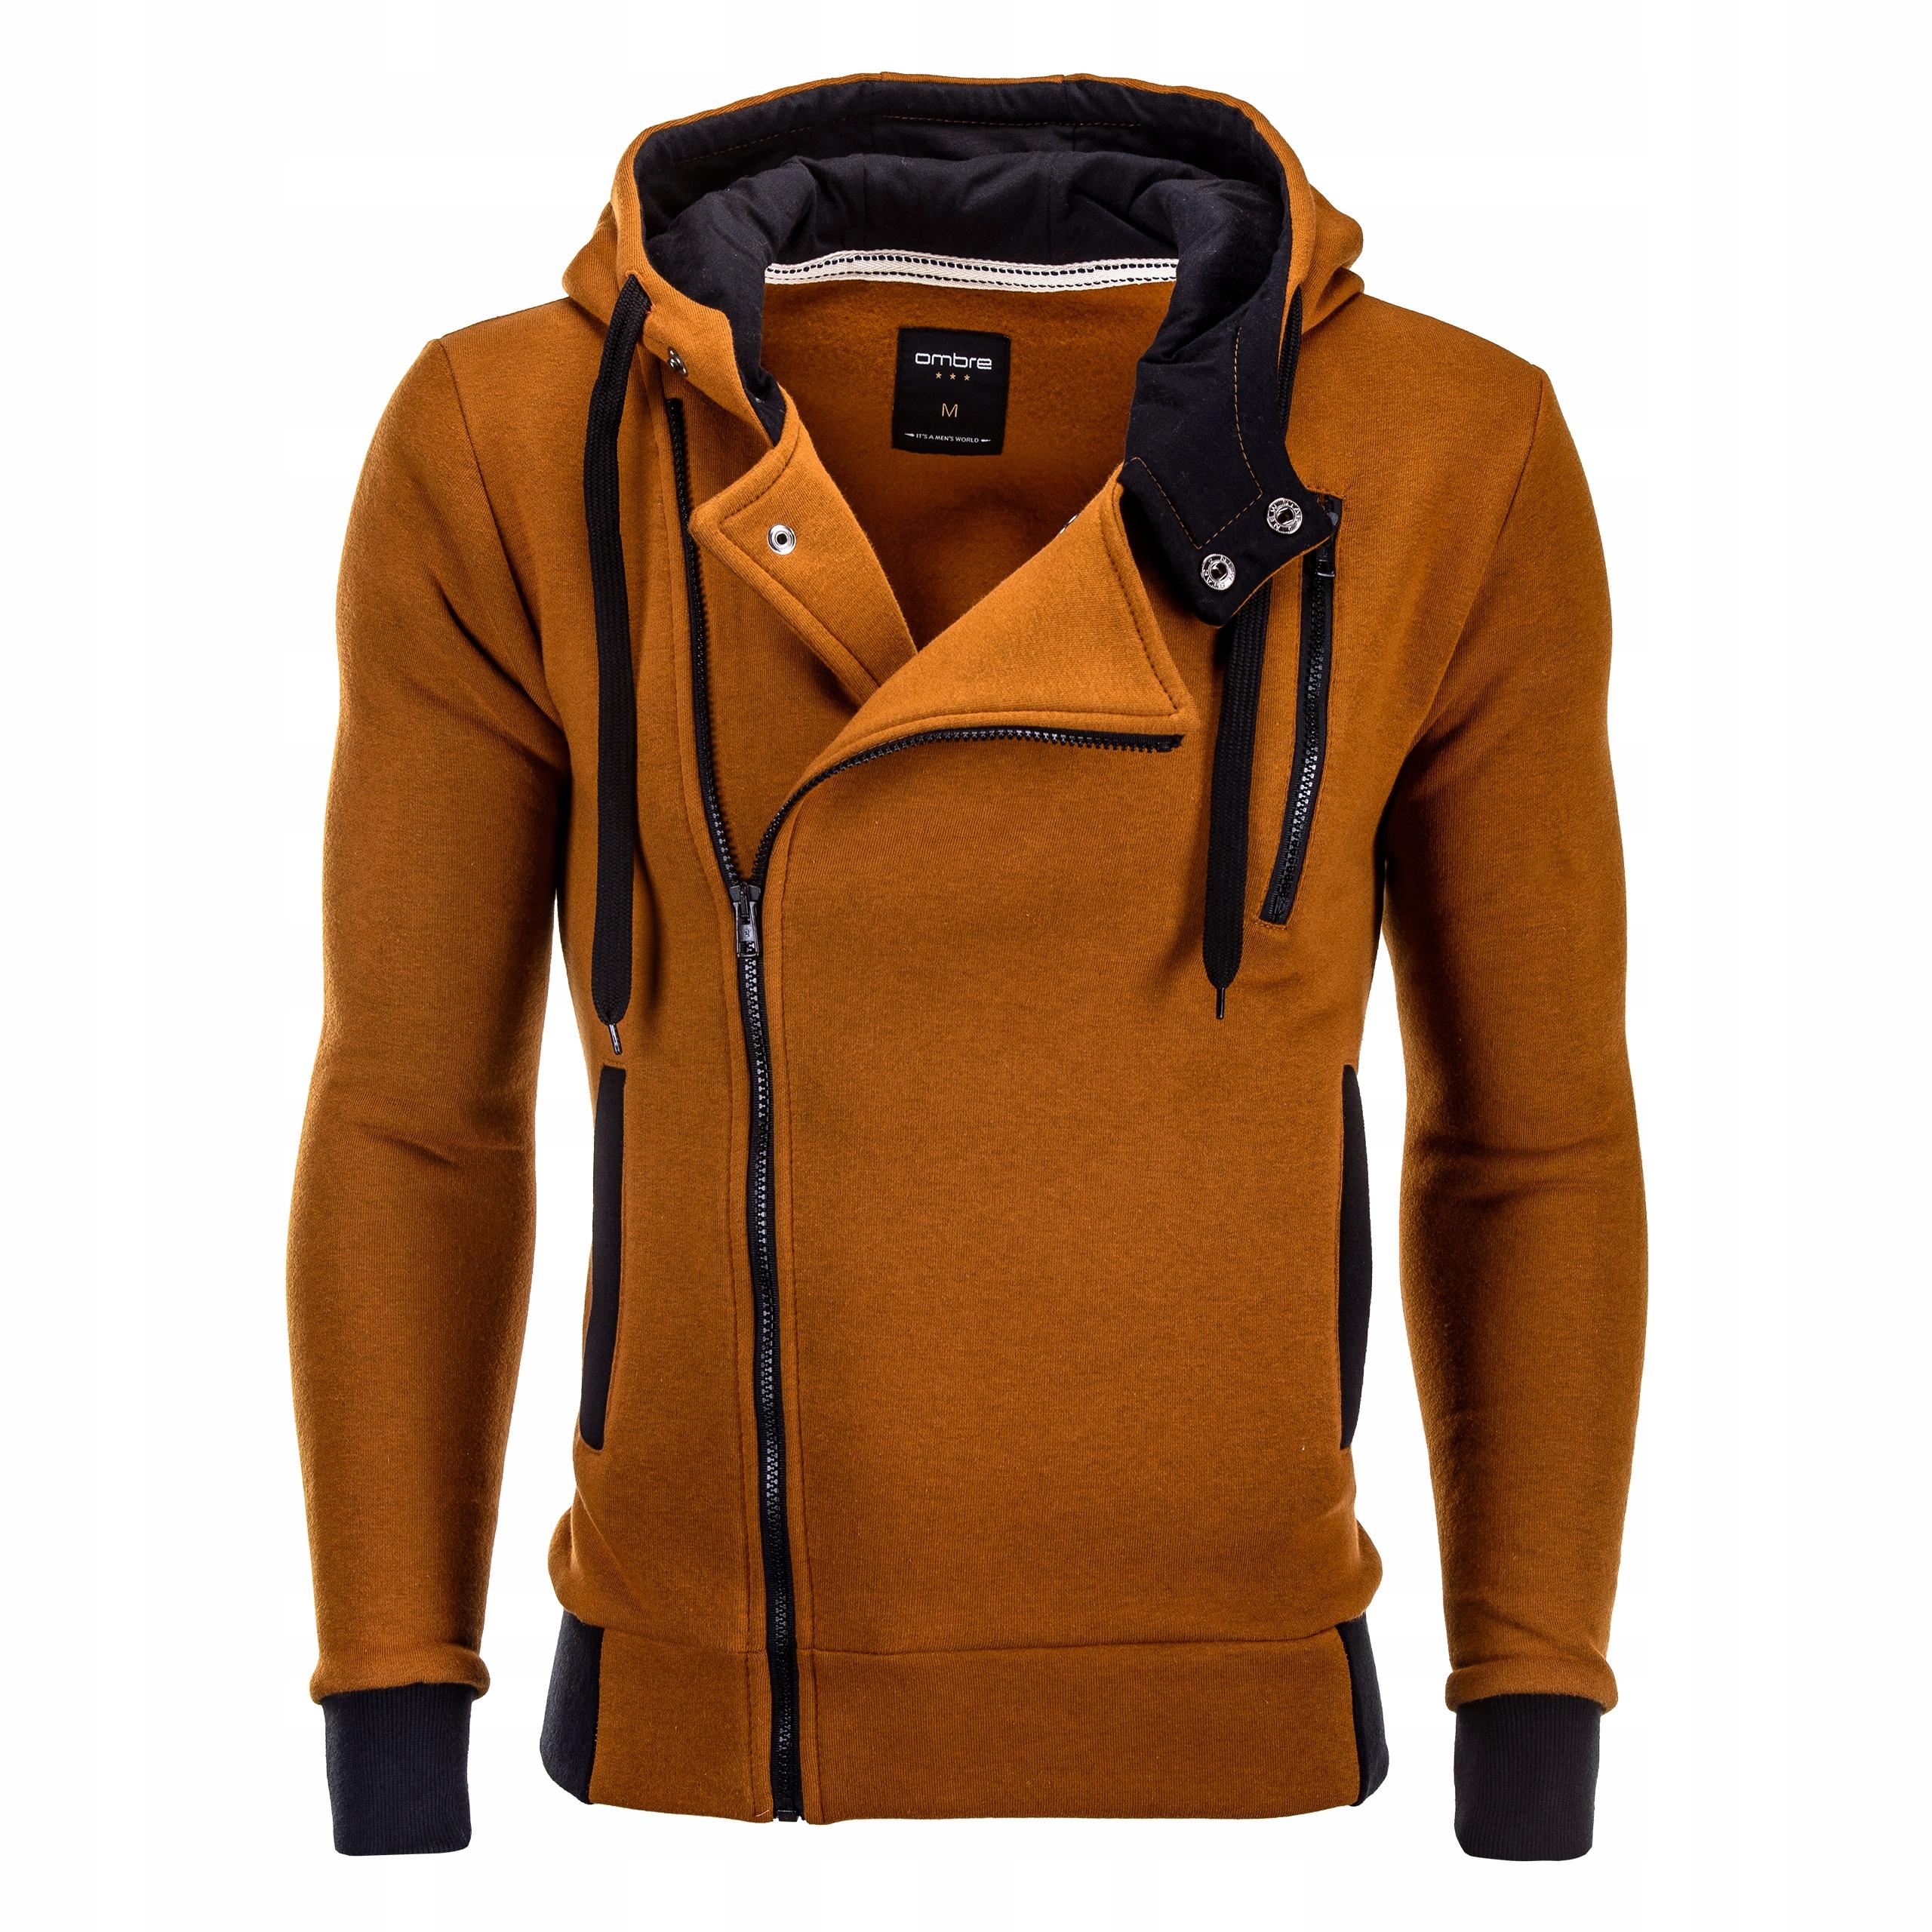 Bluza rozpinana ramoneska OMBRE B297 ruda XXL 7726162312